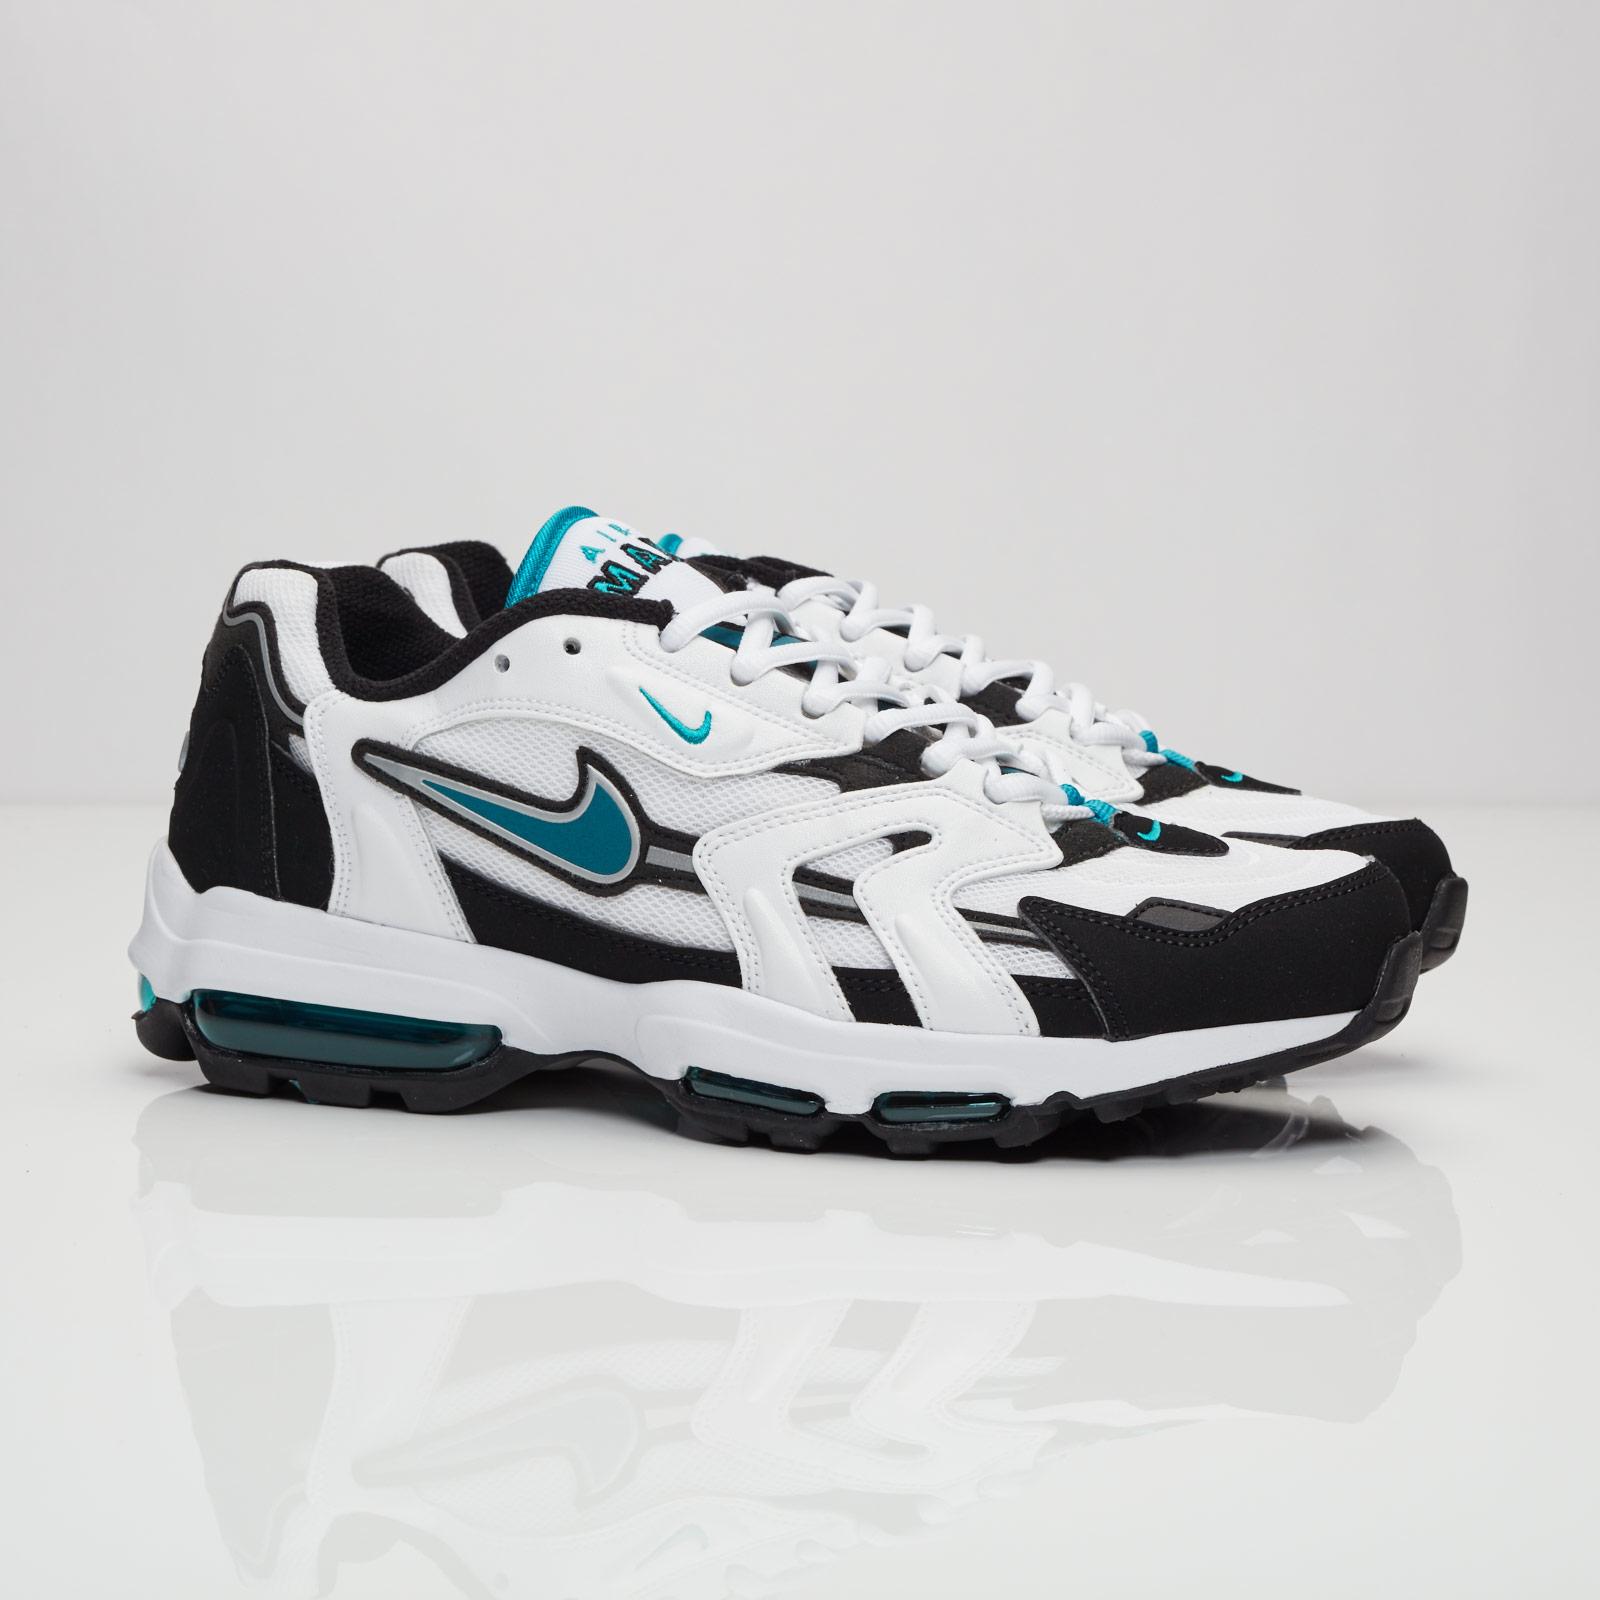 Nike Air Max 96 II XX 870166 100 Sneakersnstuff